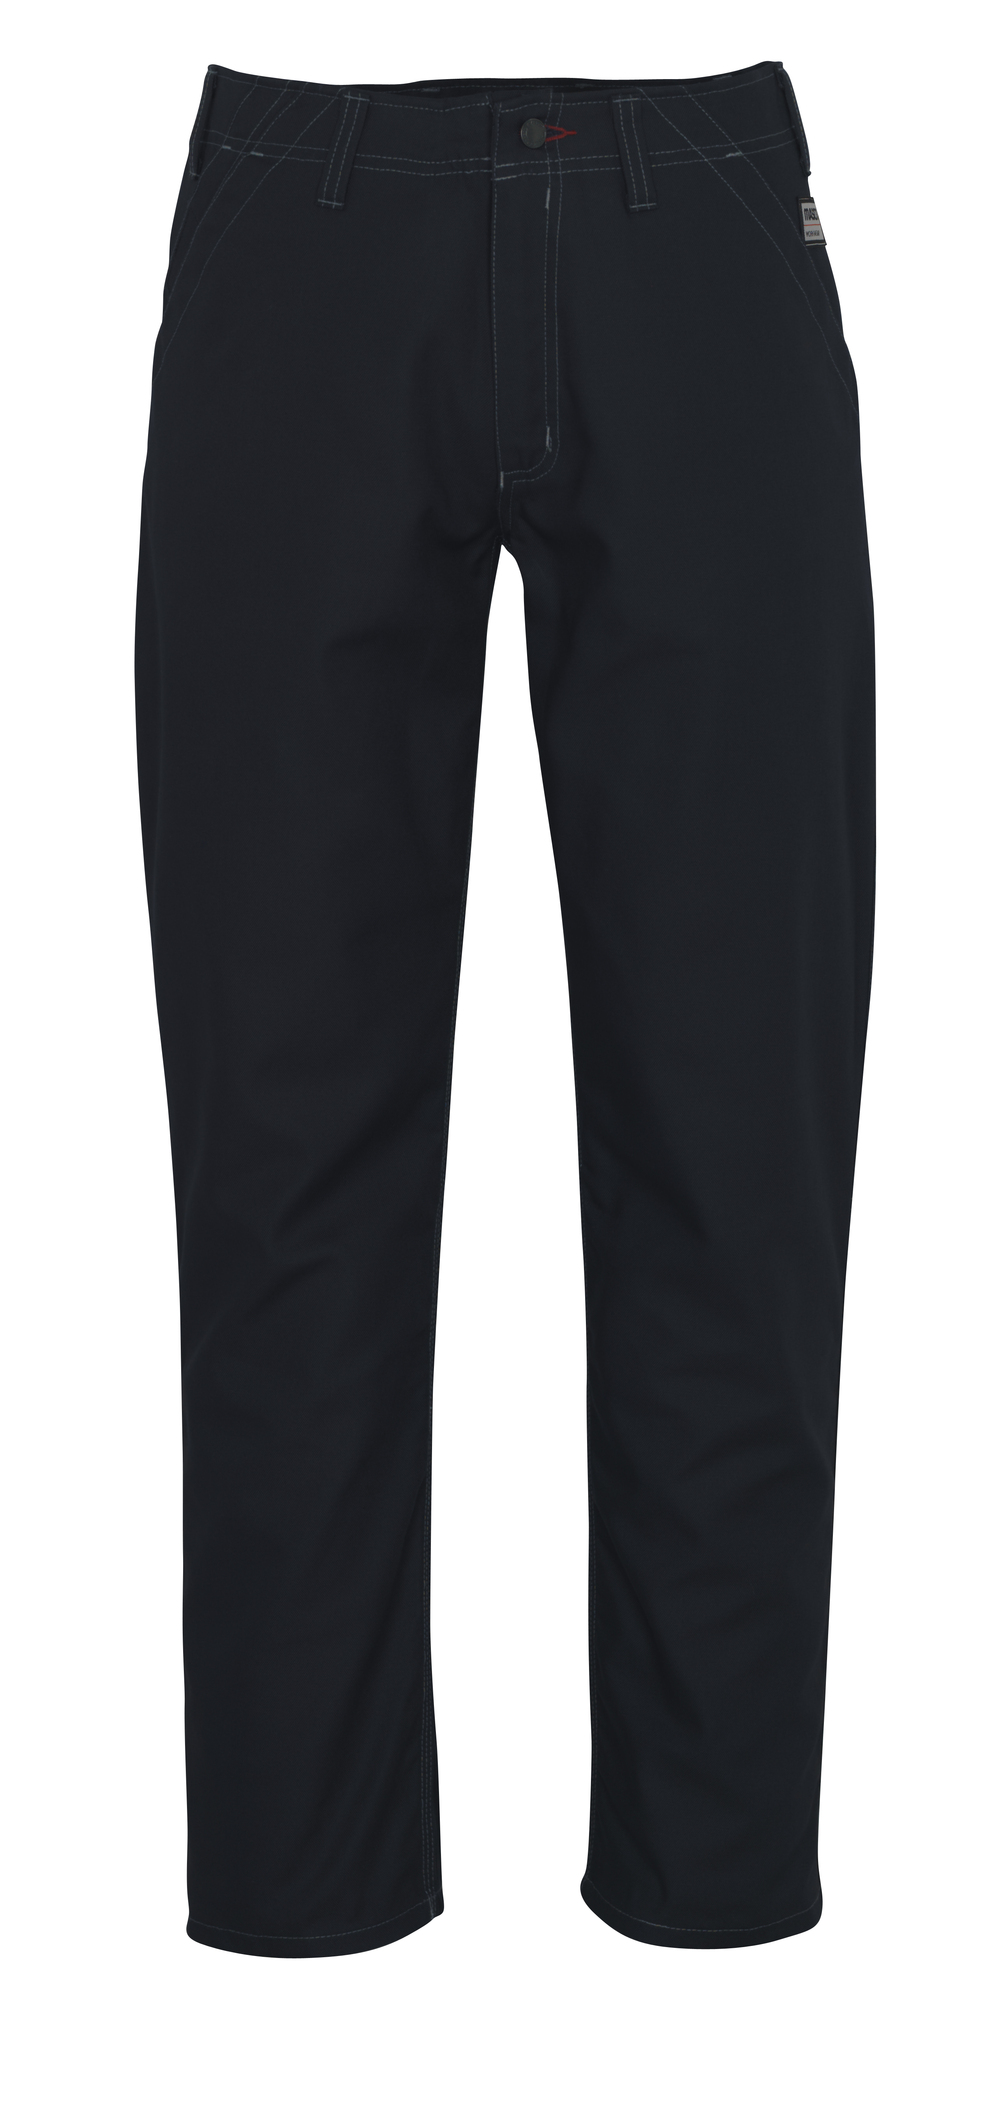 09279-154-010 Pantalones - azul marino oscuro